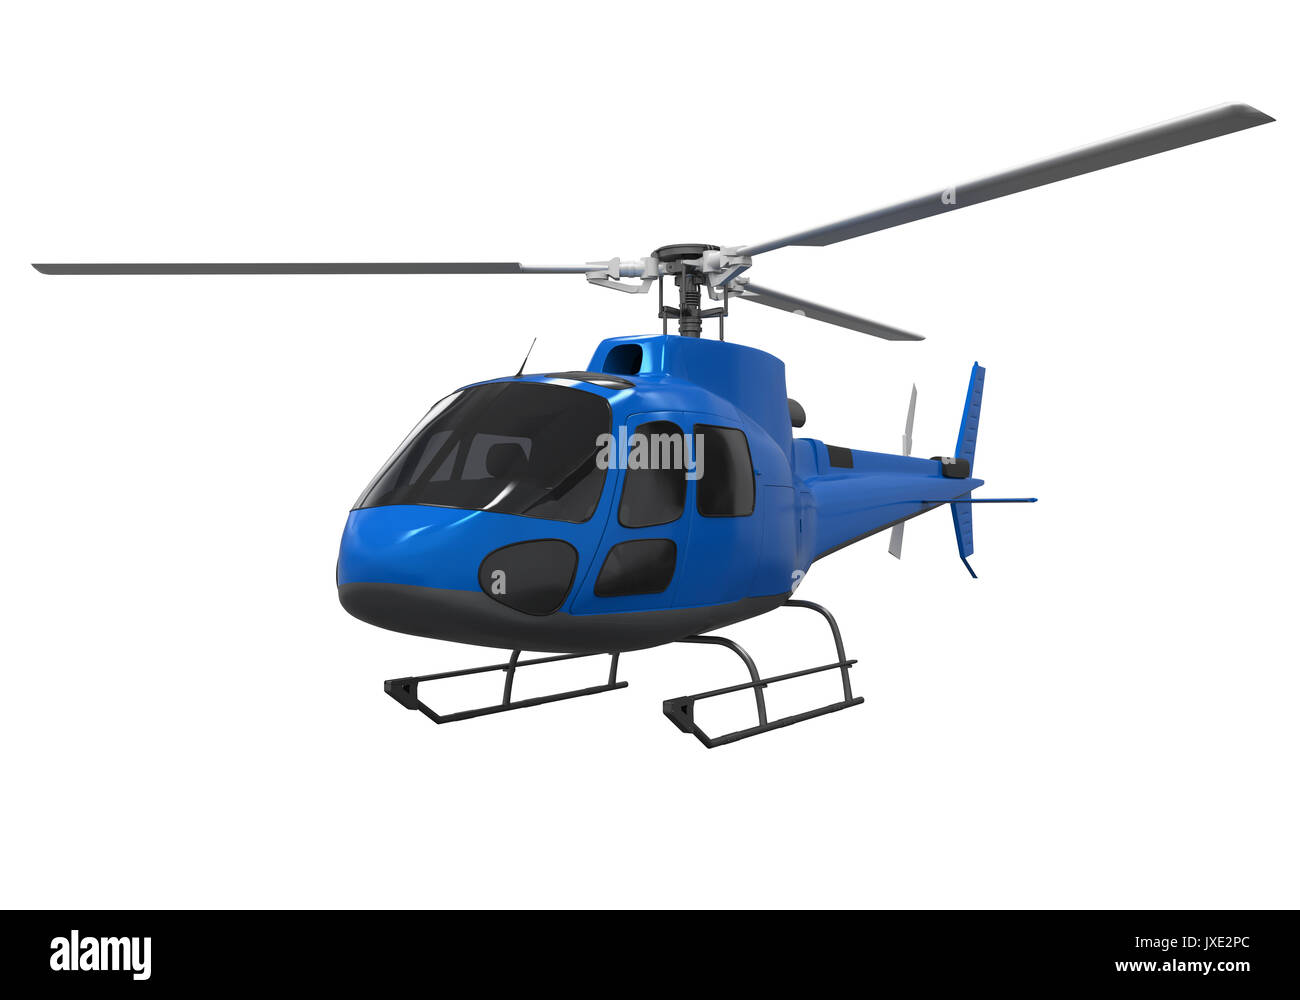 Helicopter Isolated on white background - Stock Image